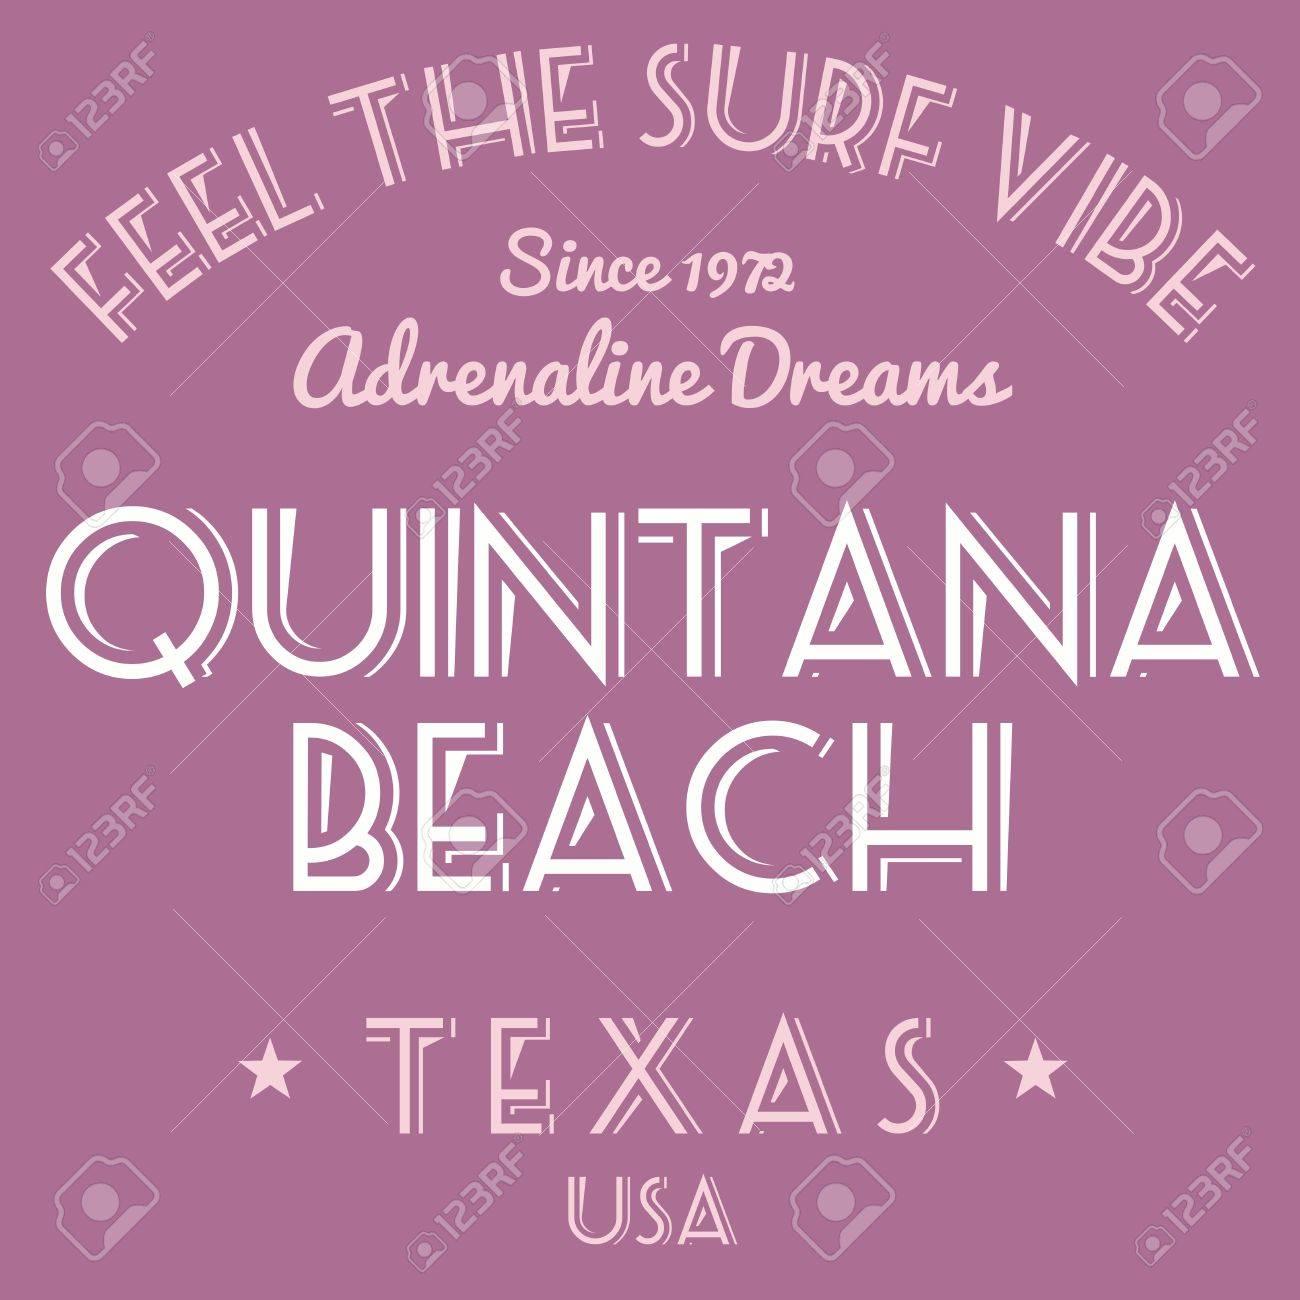 Shirt design usa - T Shirt Design Fashion Graphics Surfing Vacation Typography Quintana Beach Texas